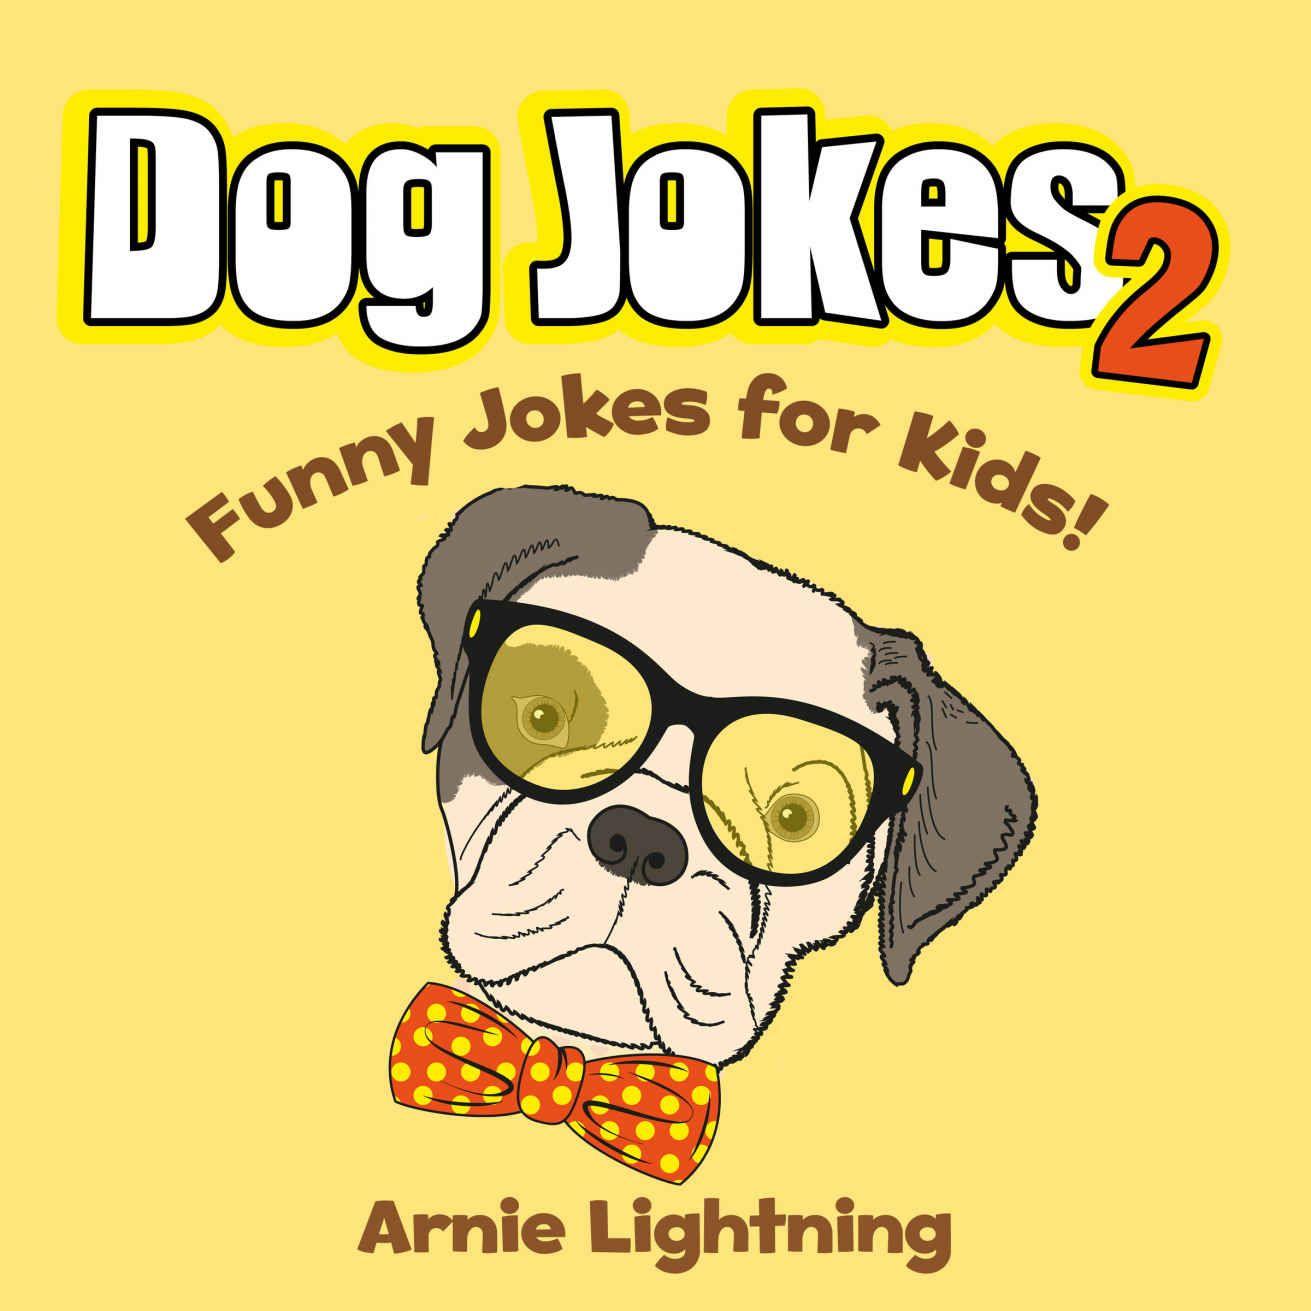 Freebookshub Com Download Free Kindle Books And Prime Kindle Books Jokes For Kids Dog Jokes Funny Jokes For Kids